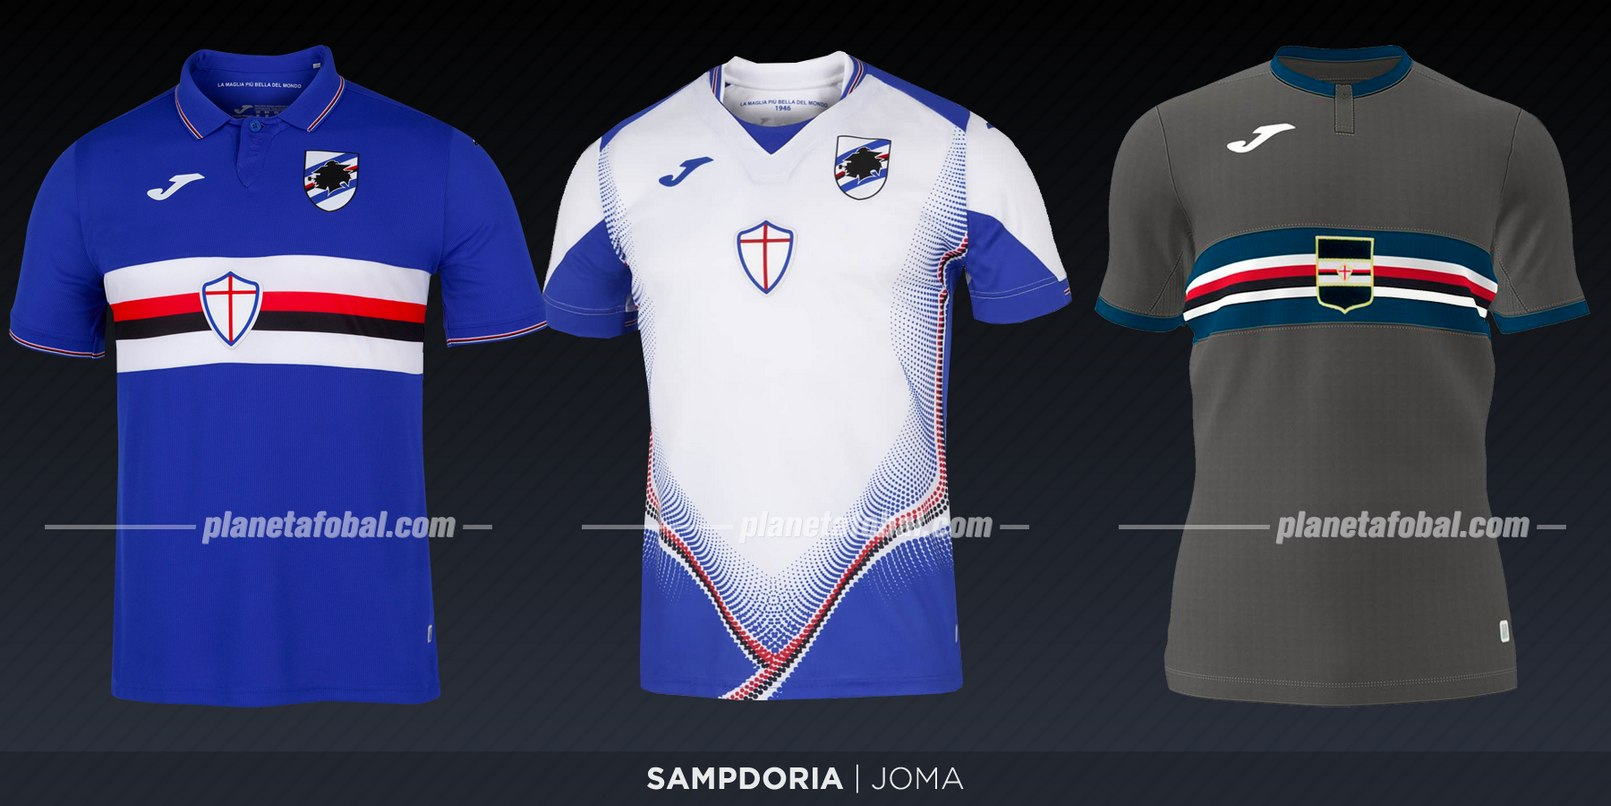 Sampdoria (Joma) | Camisetas de la Serie A 2019-2020